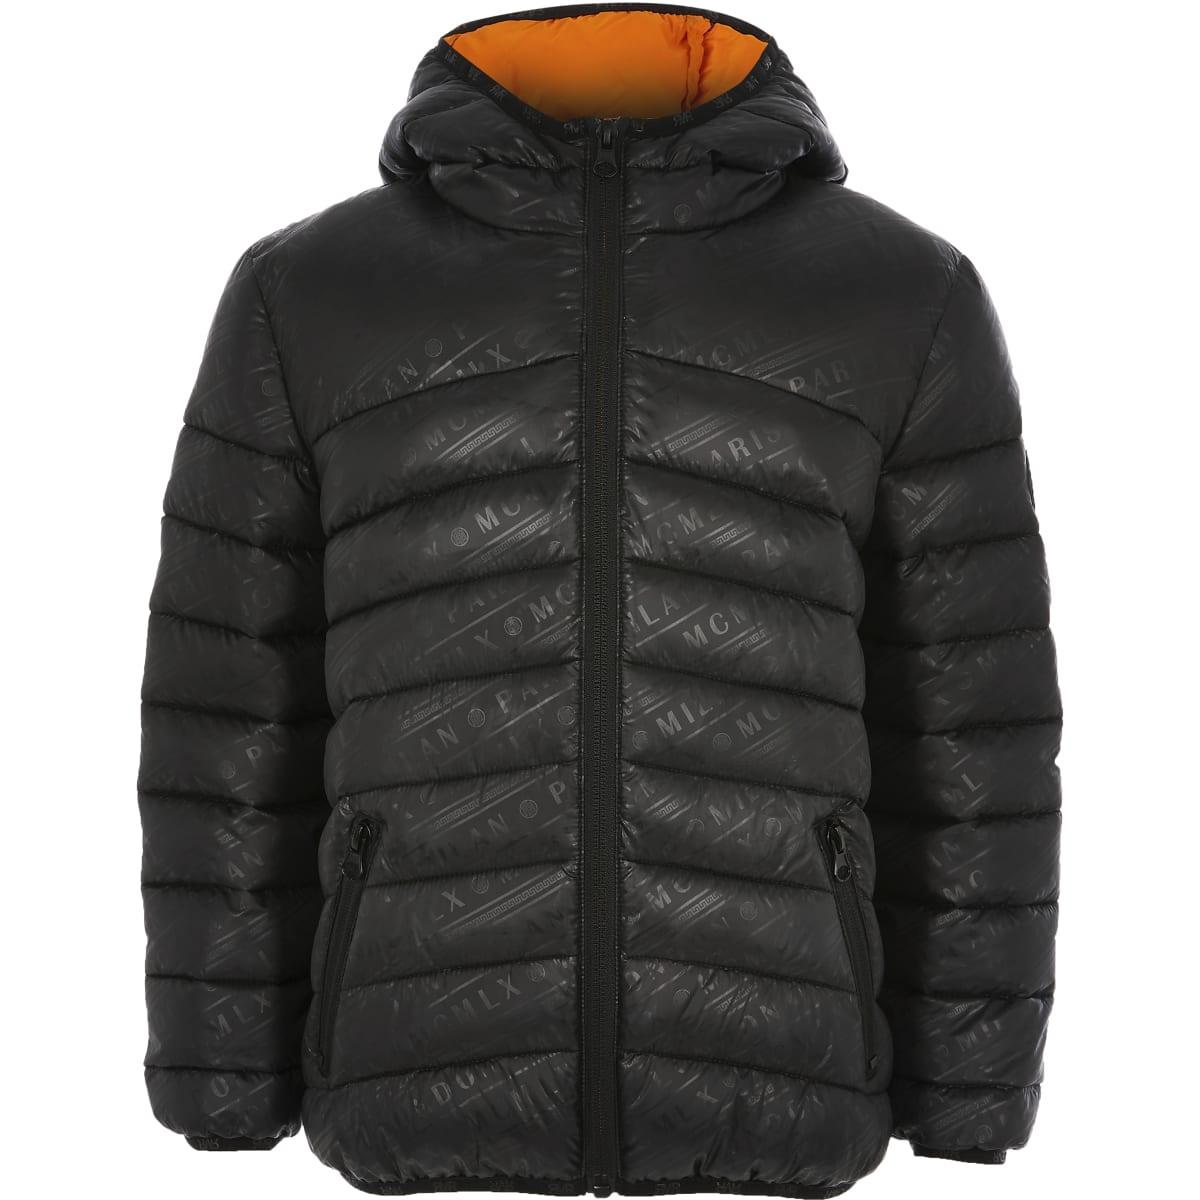 Boys black printed padded jacket